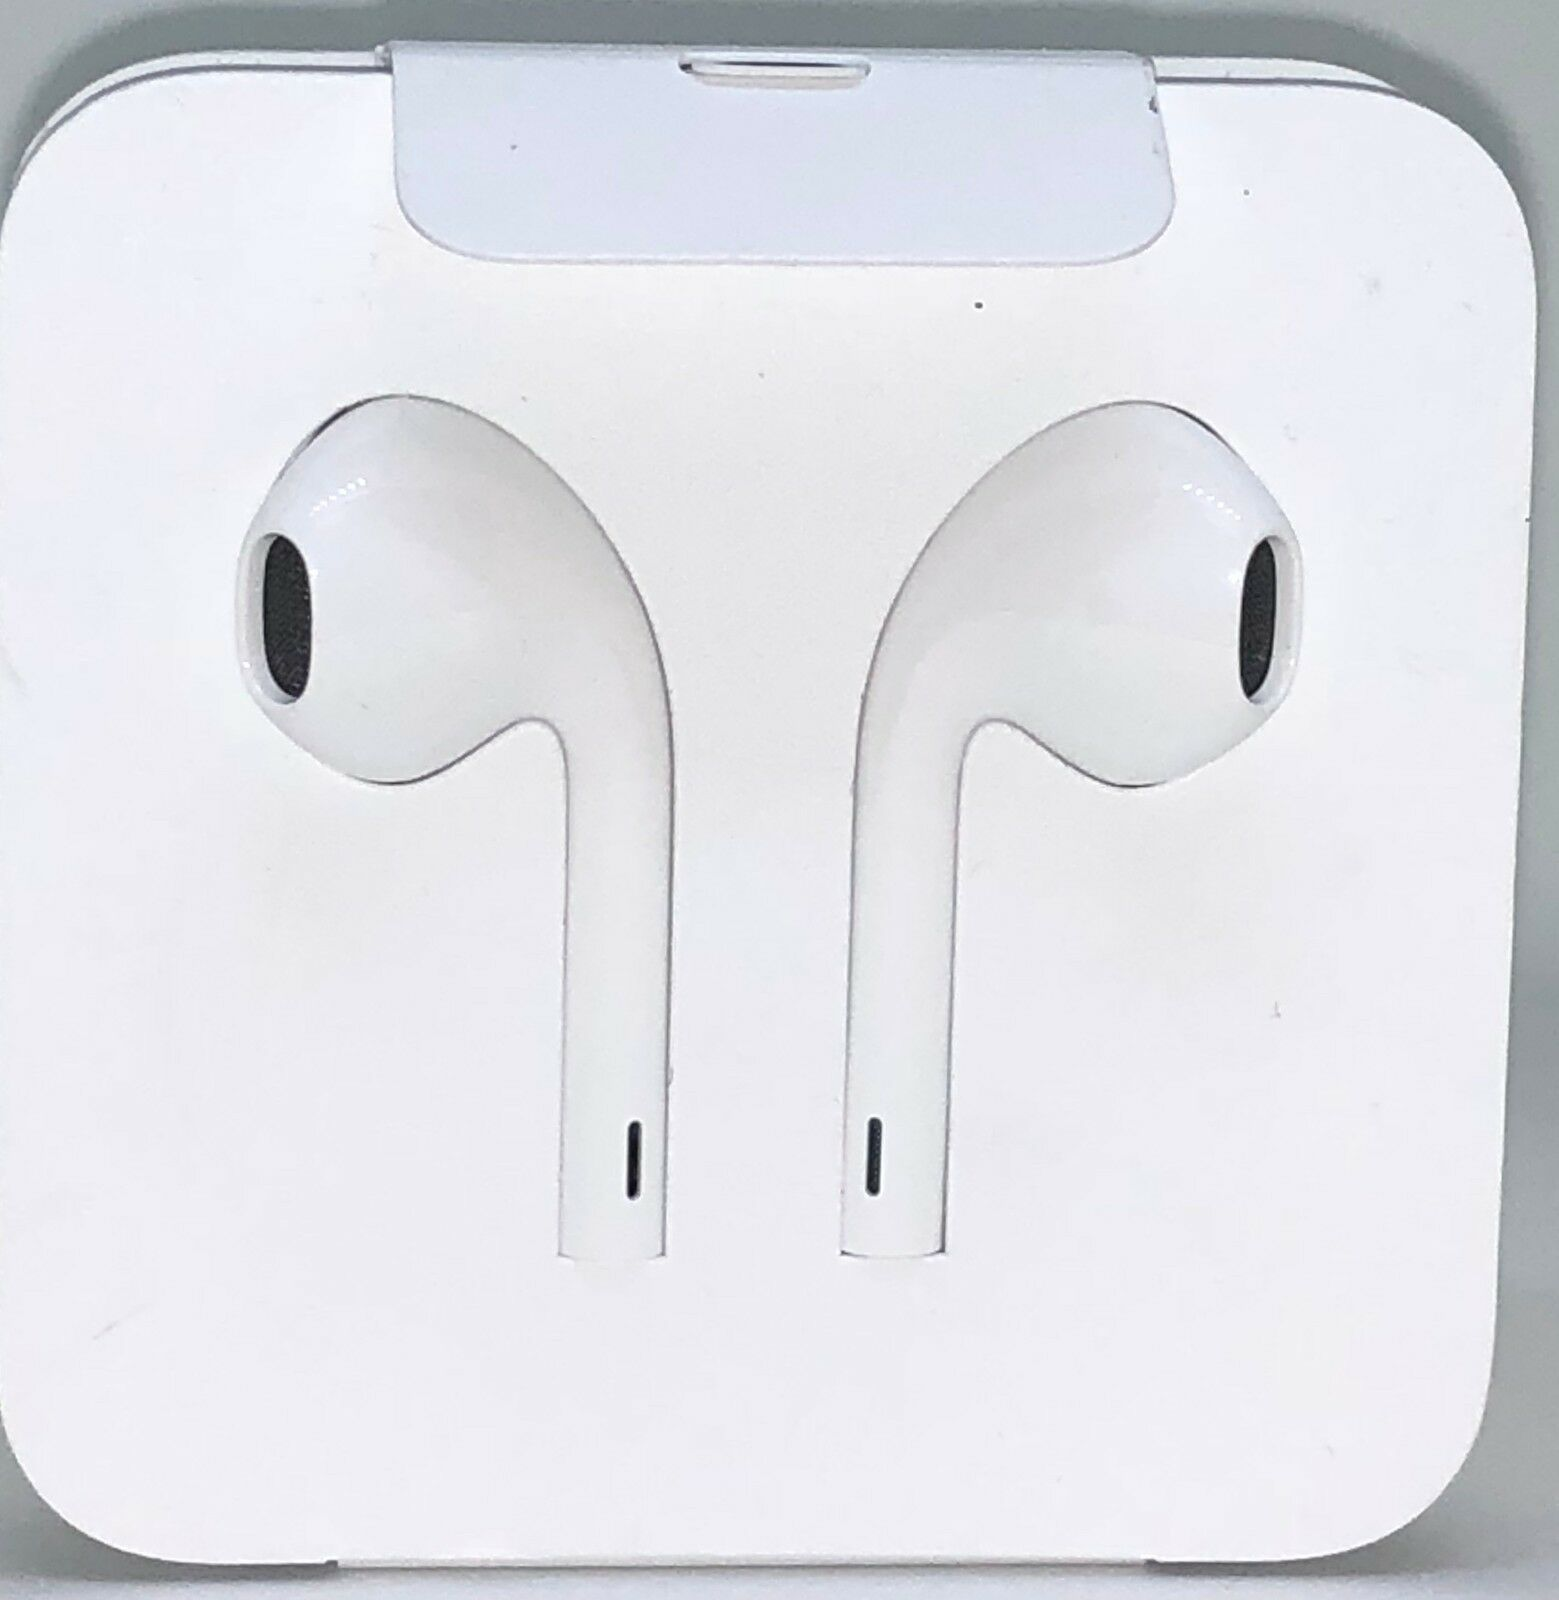 Apple iPhone 7 Plus 8 Plus X Original EarPods Headphones Ear